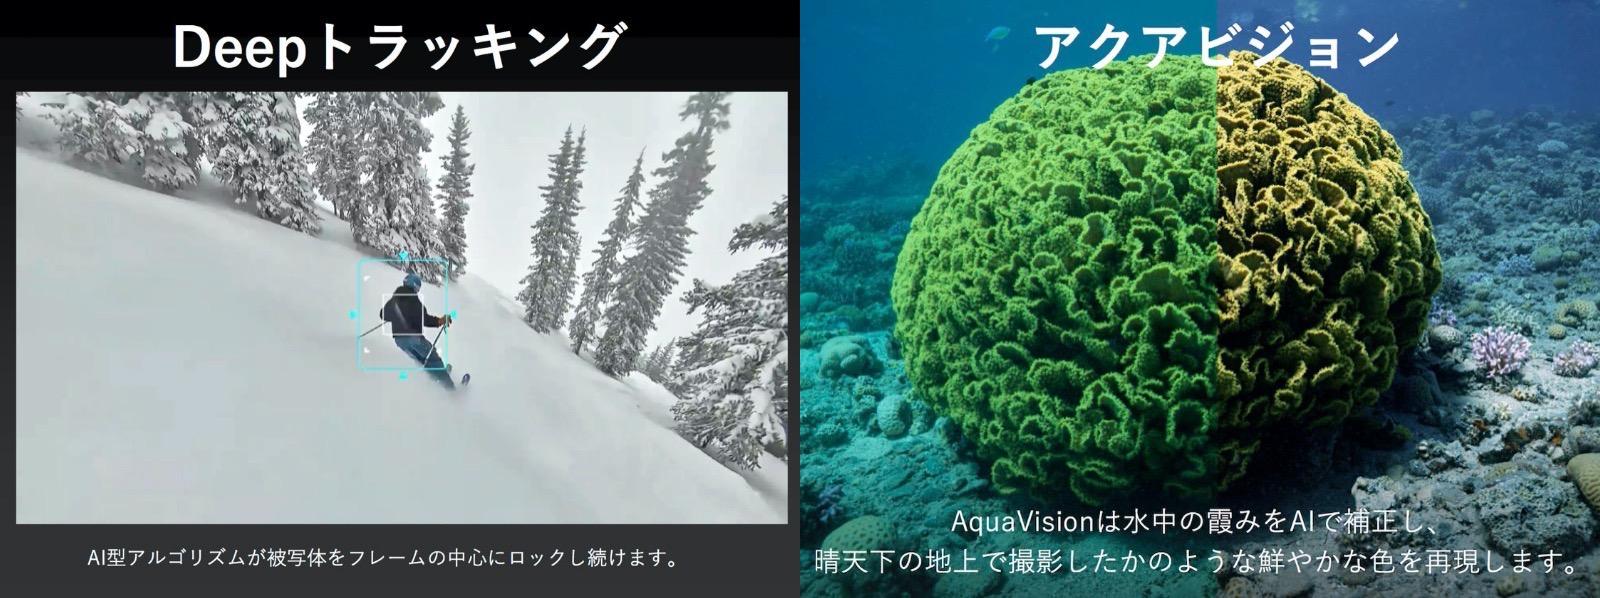 DeepTracking and AquaVision